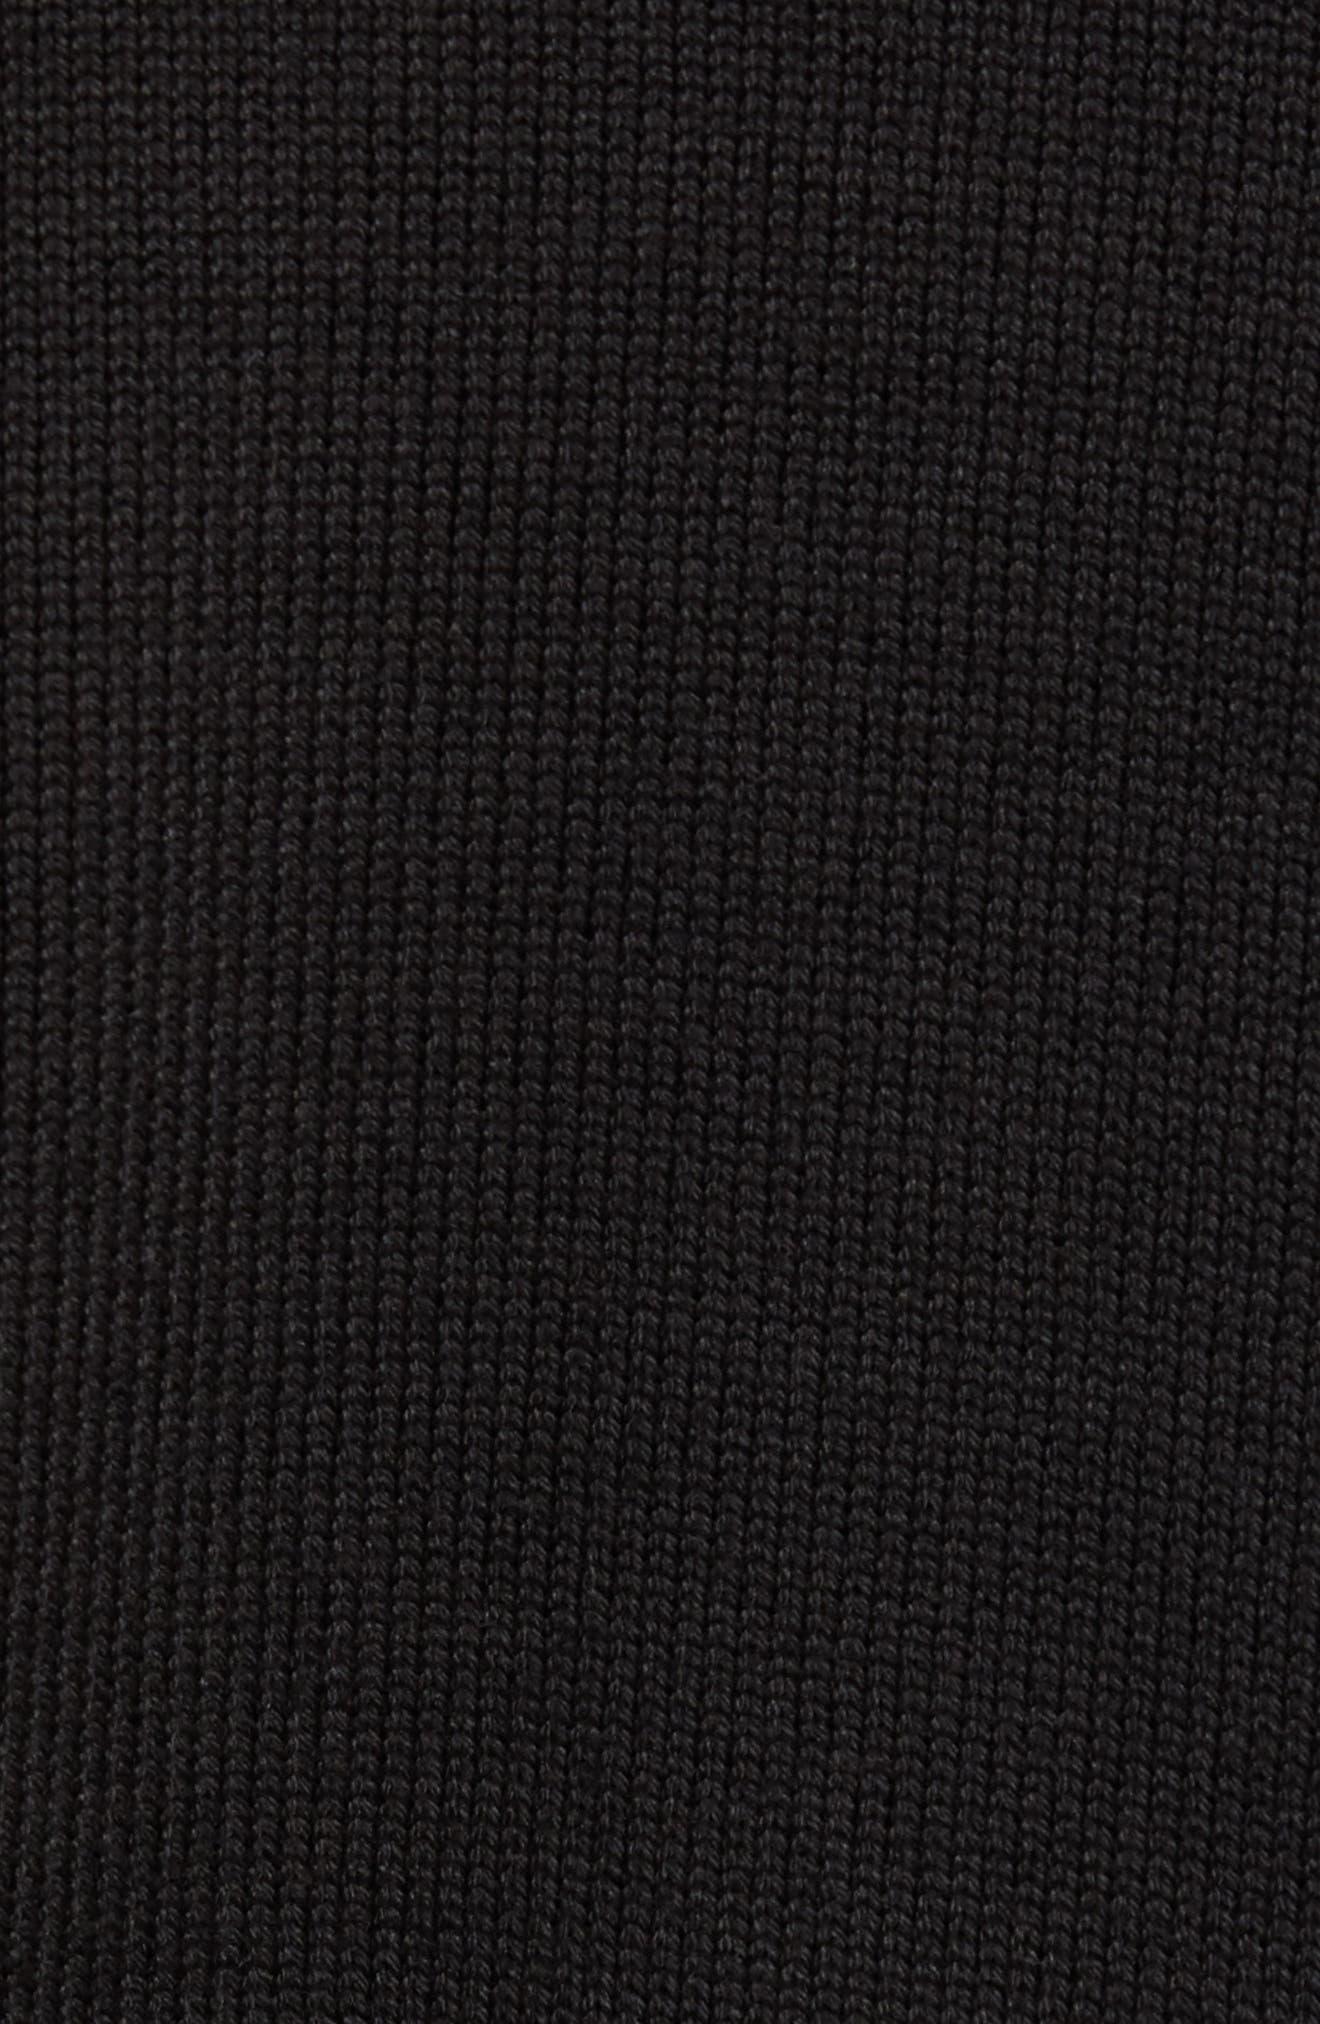 Lined Jean Jacket,                             Alternate thumbnail 5, color,                             BLACK